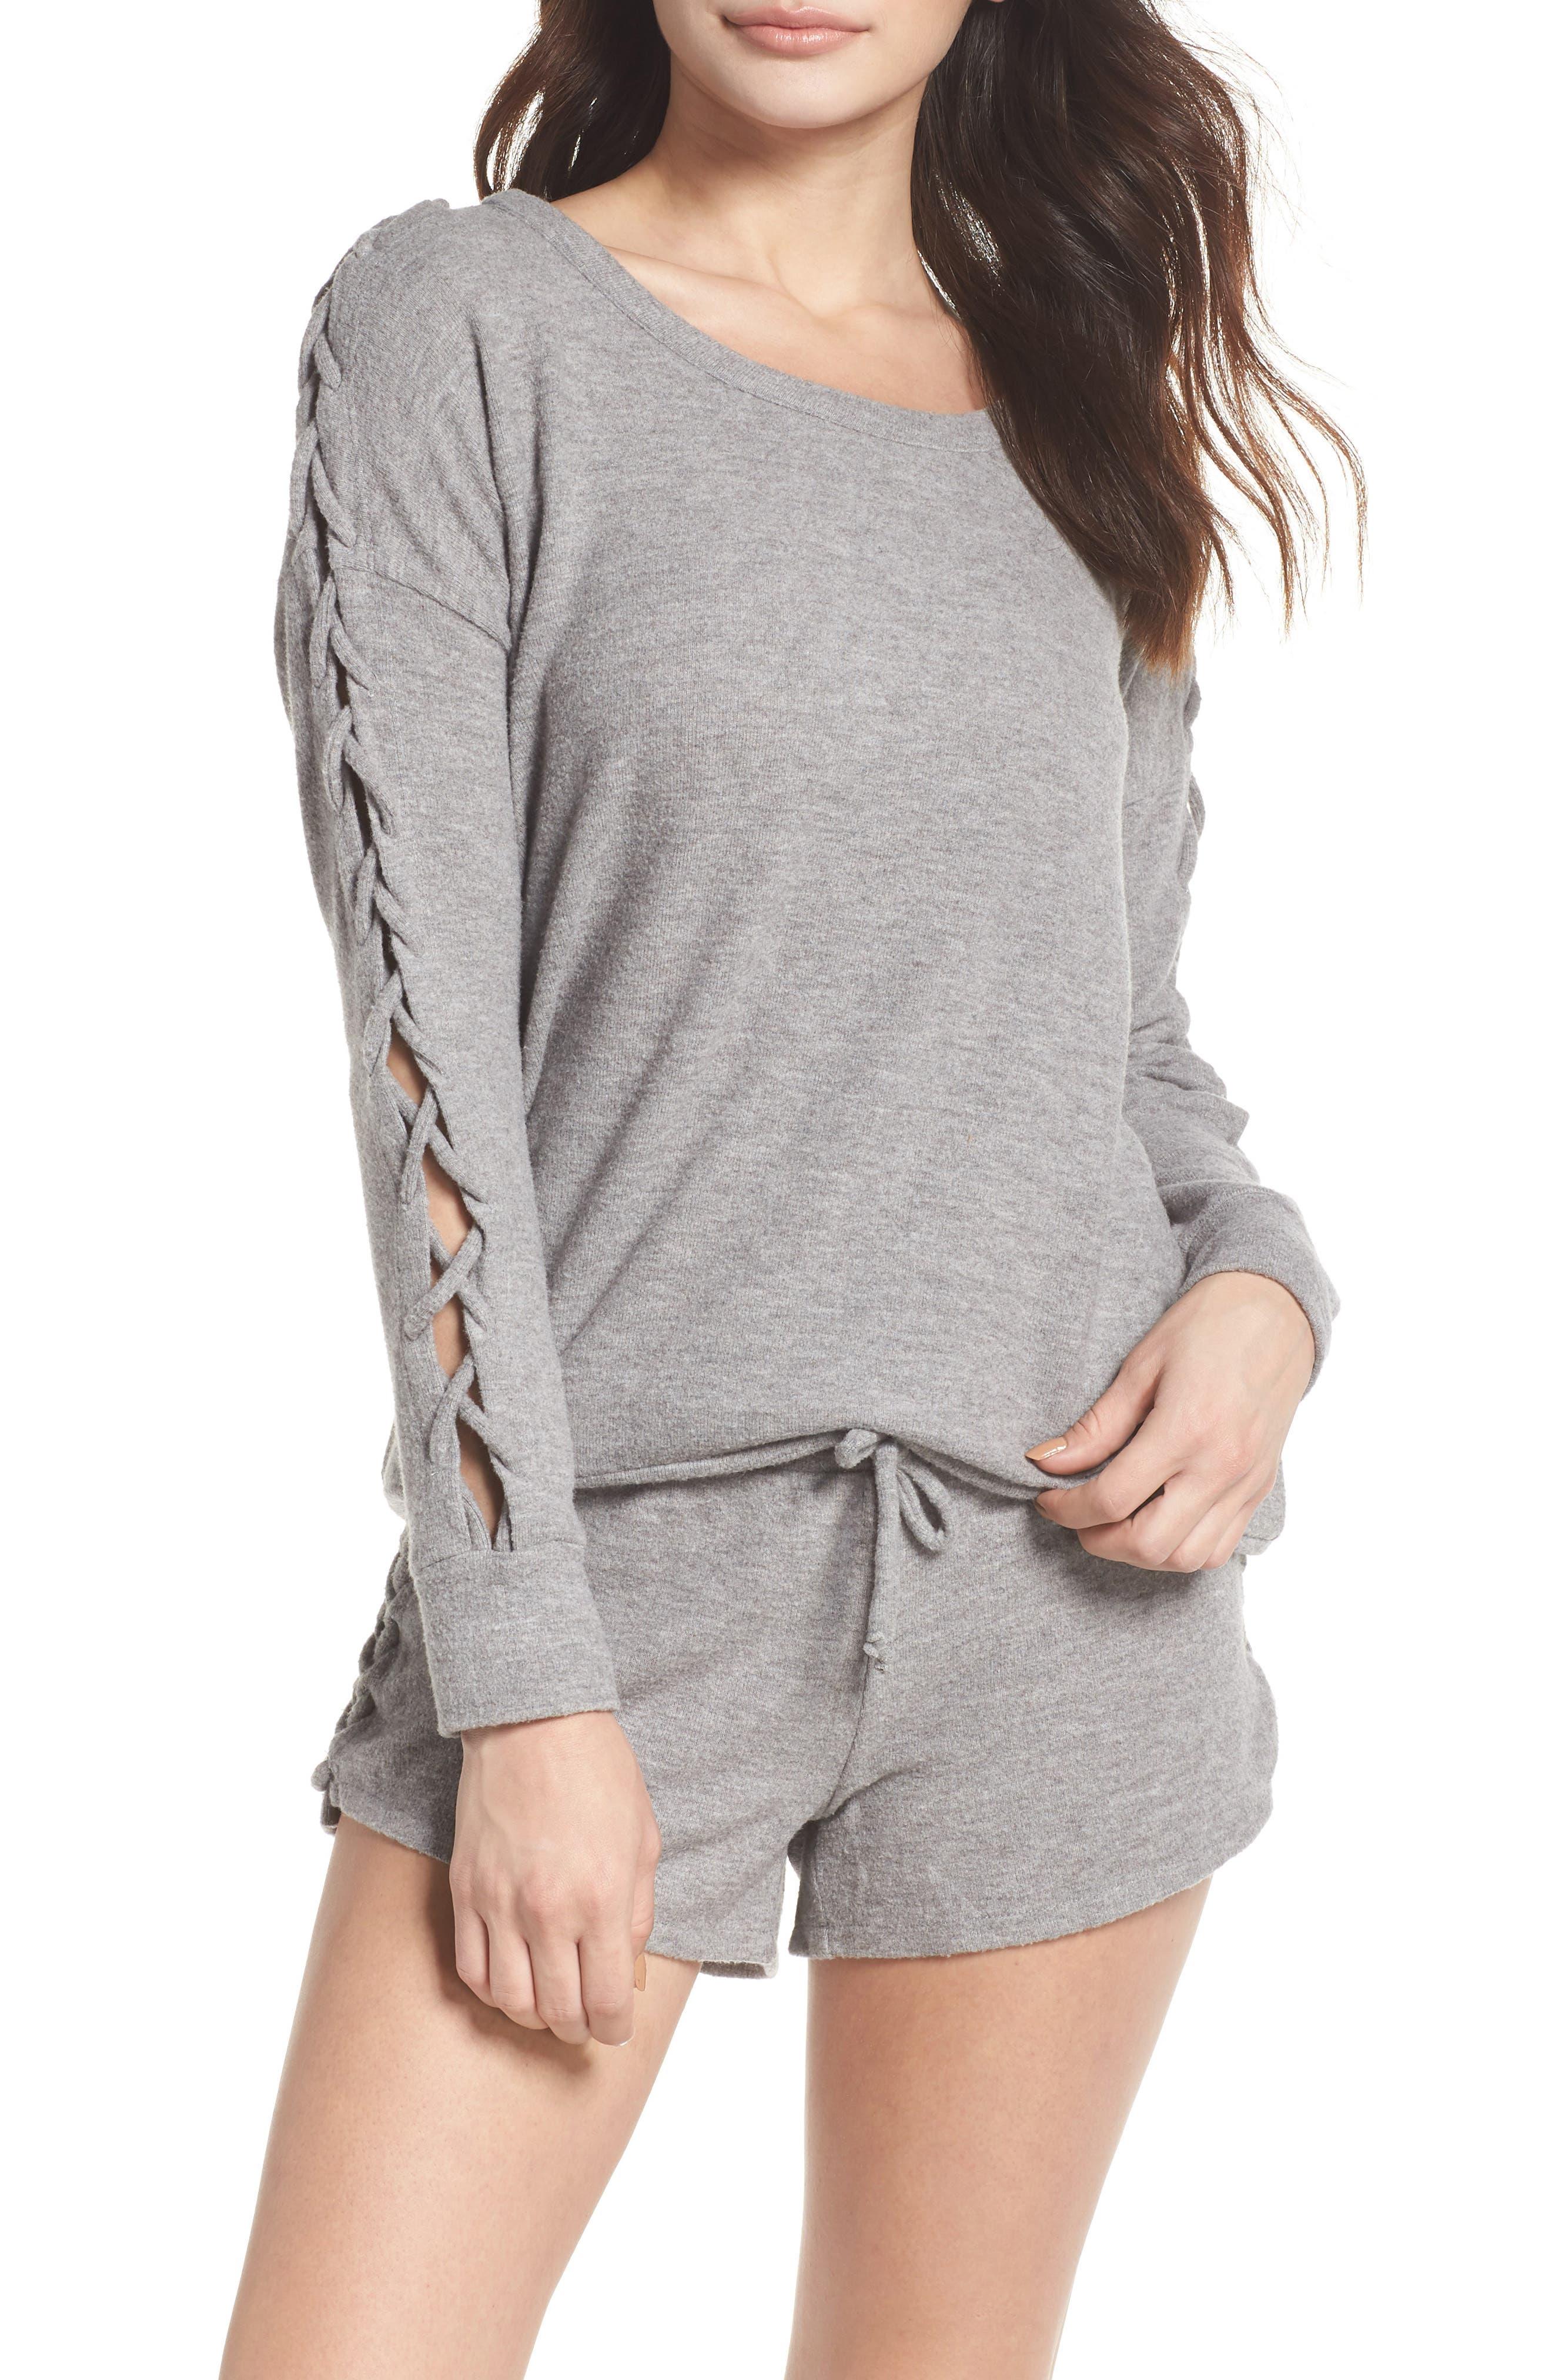 Chaser Love Lace-Up Sleeve Sweatshirt